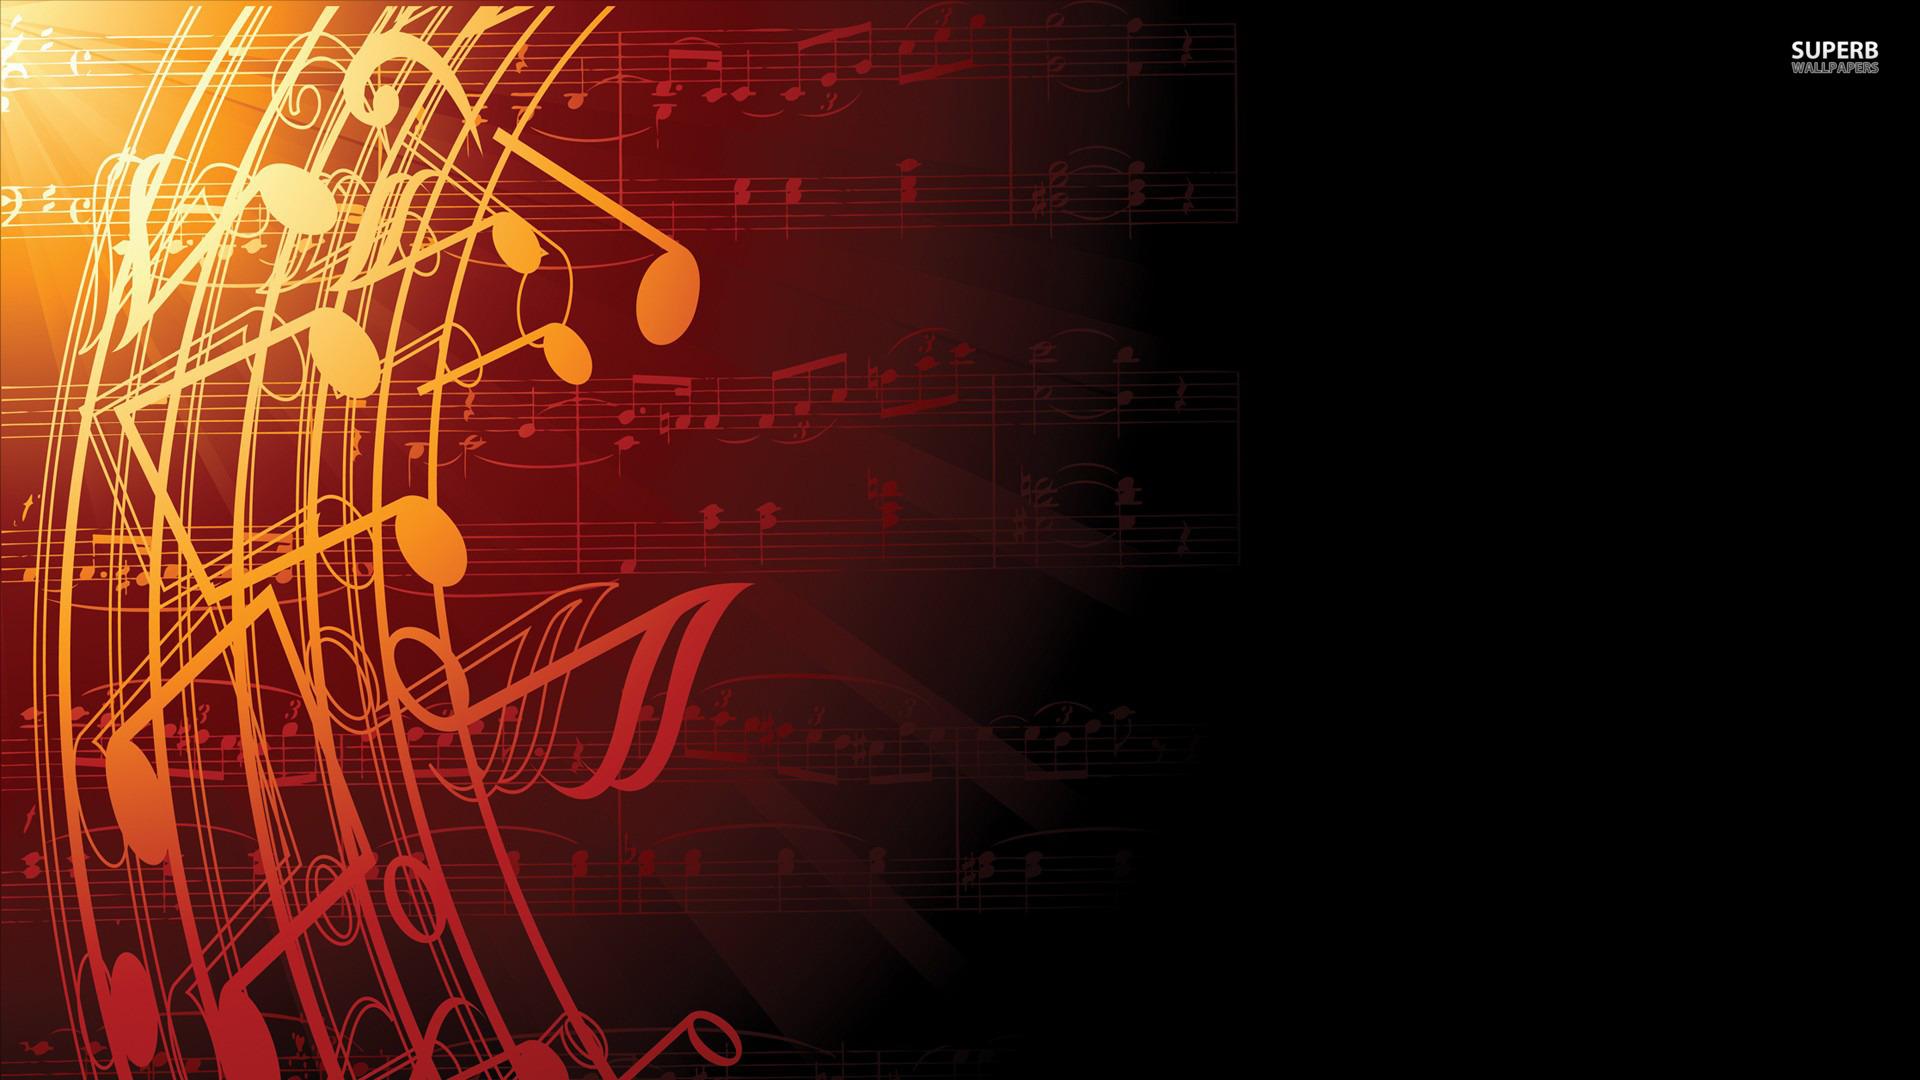 Wallpaper Music Notes Desktop Image 1920x1080